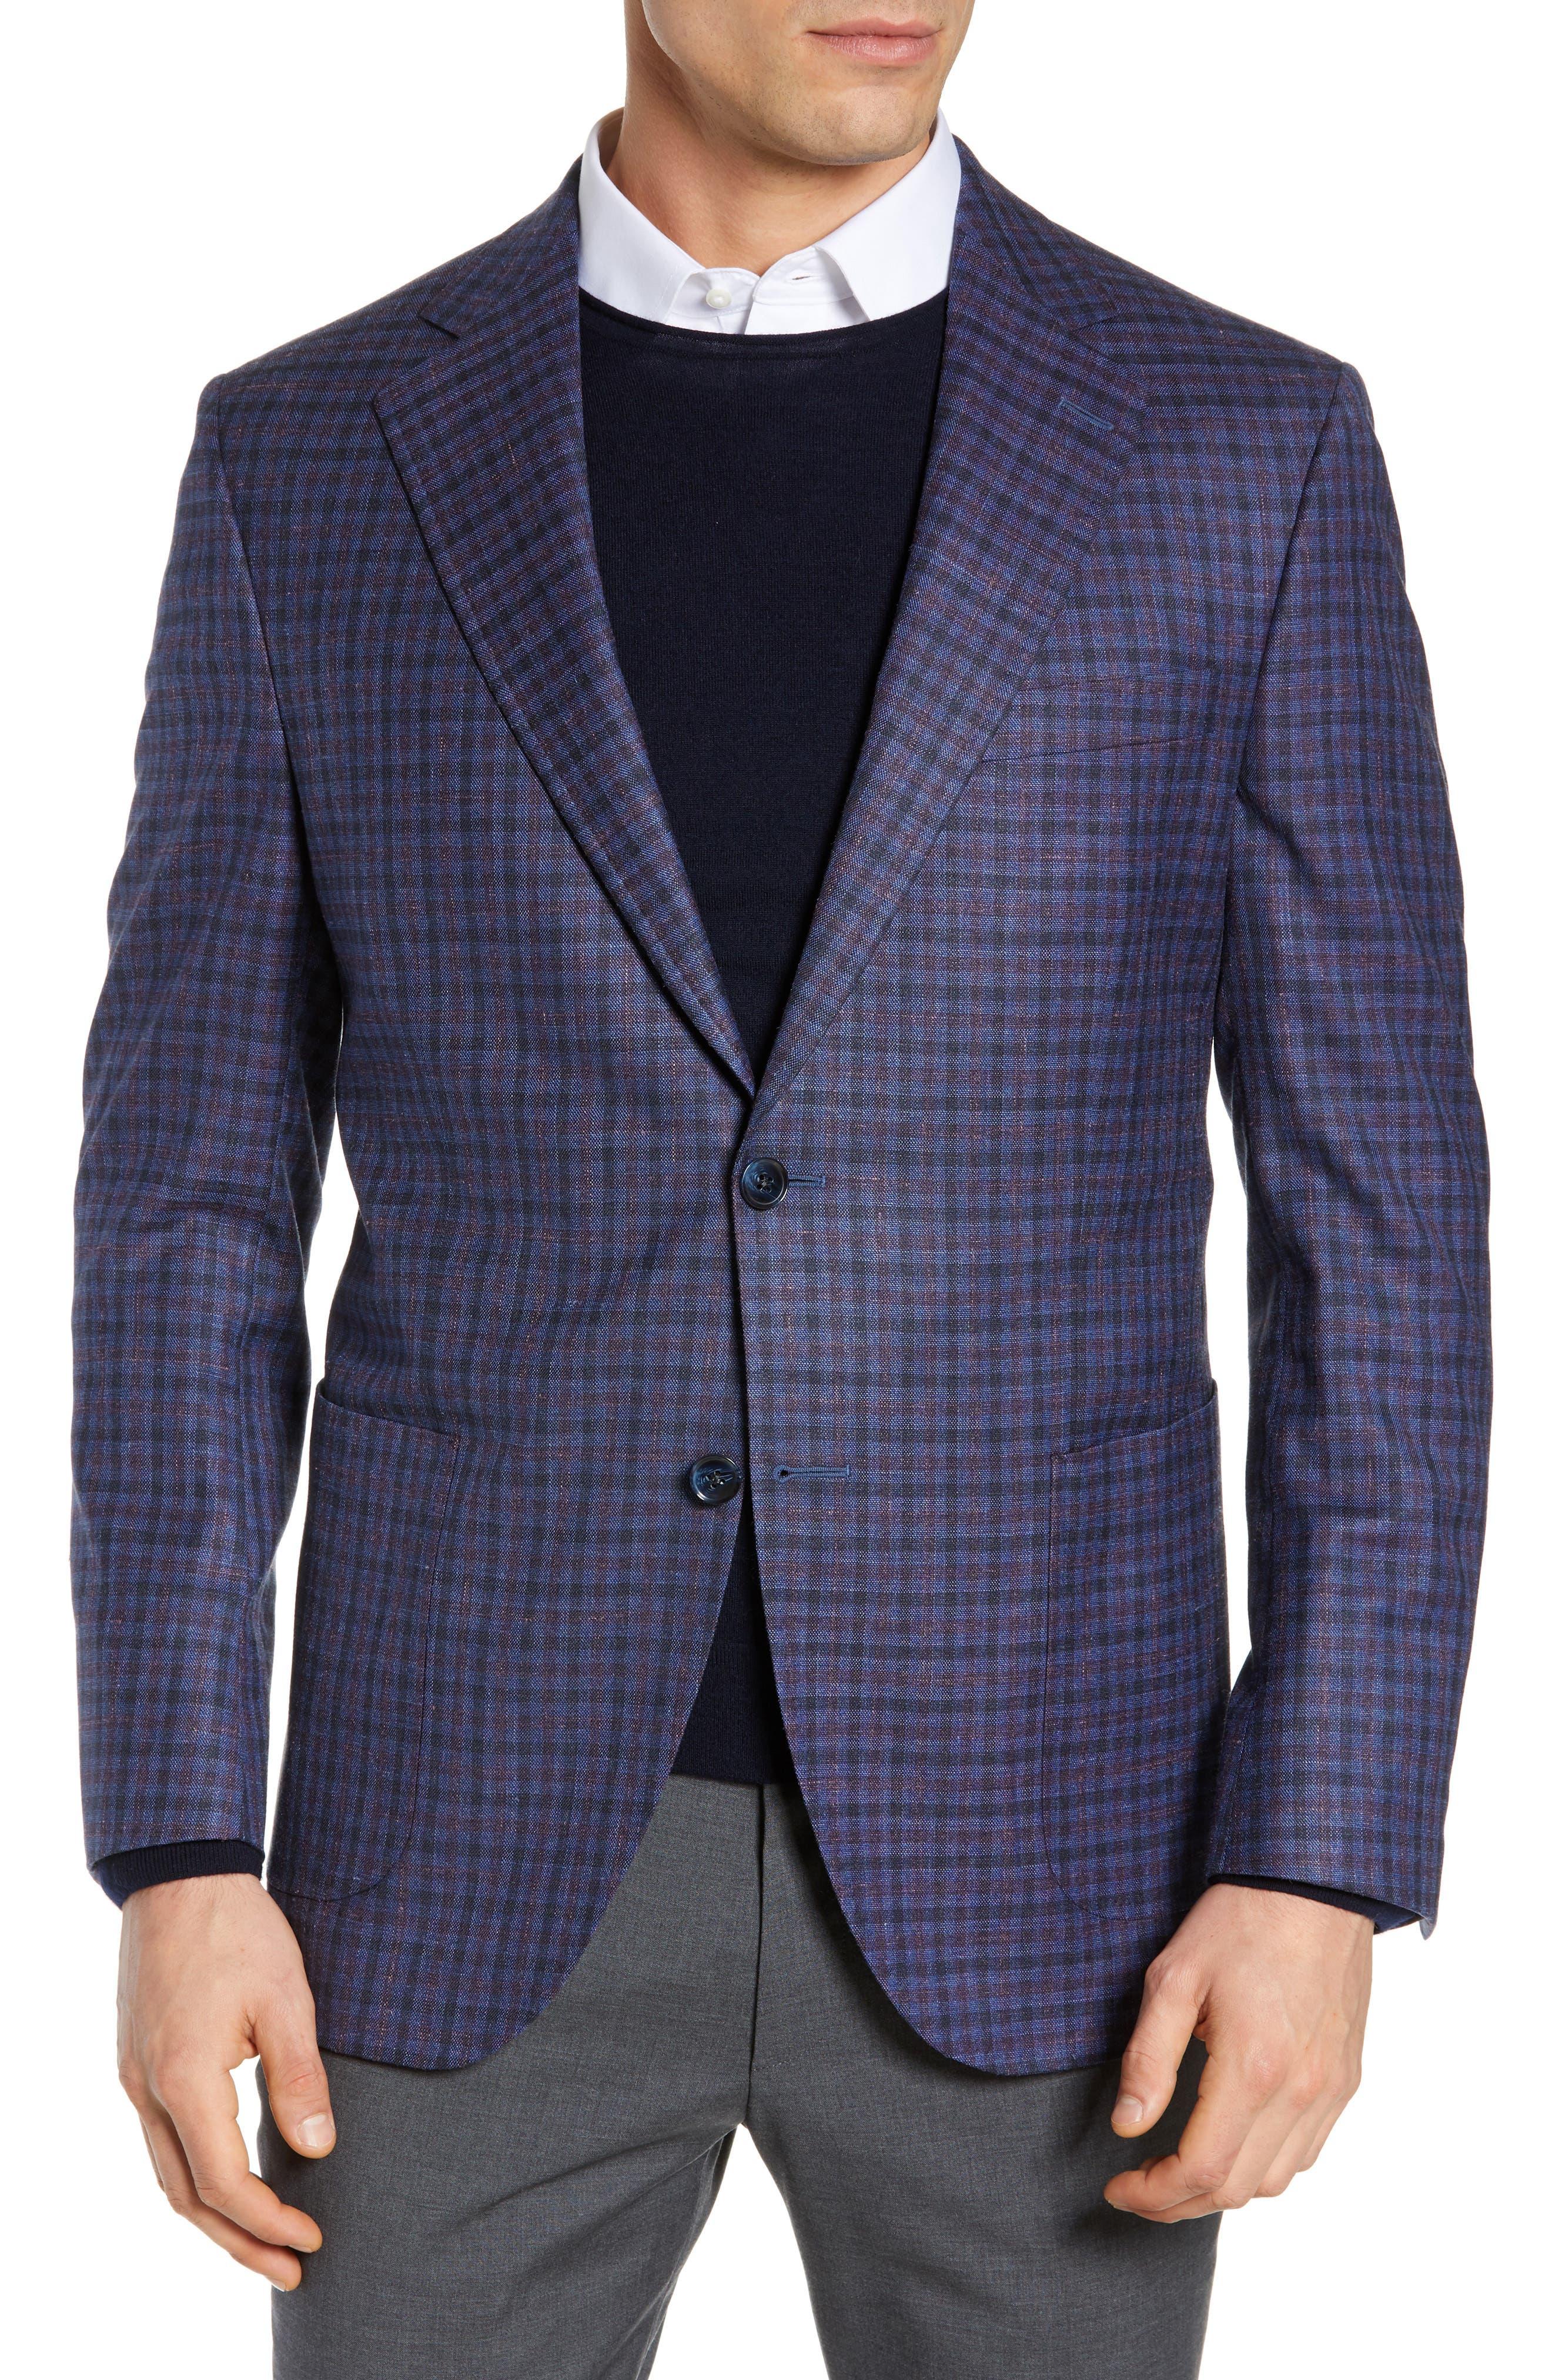 PETER MILLAR, Hyperlight Classic Fit Check Wool Blend Sport Coat, Main thumbnail 1, color, BLUE